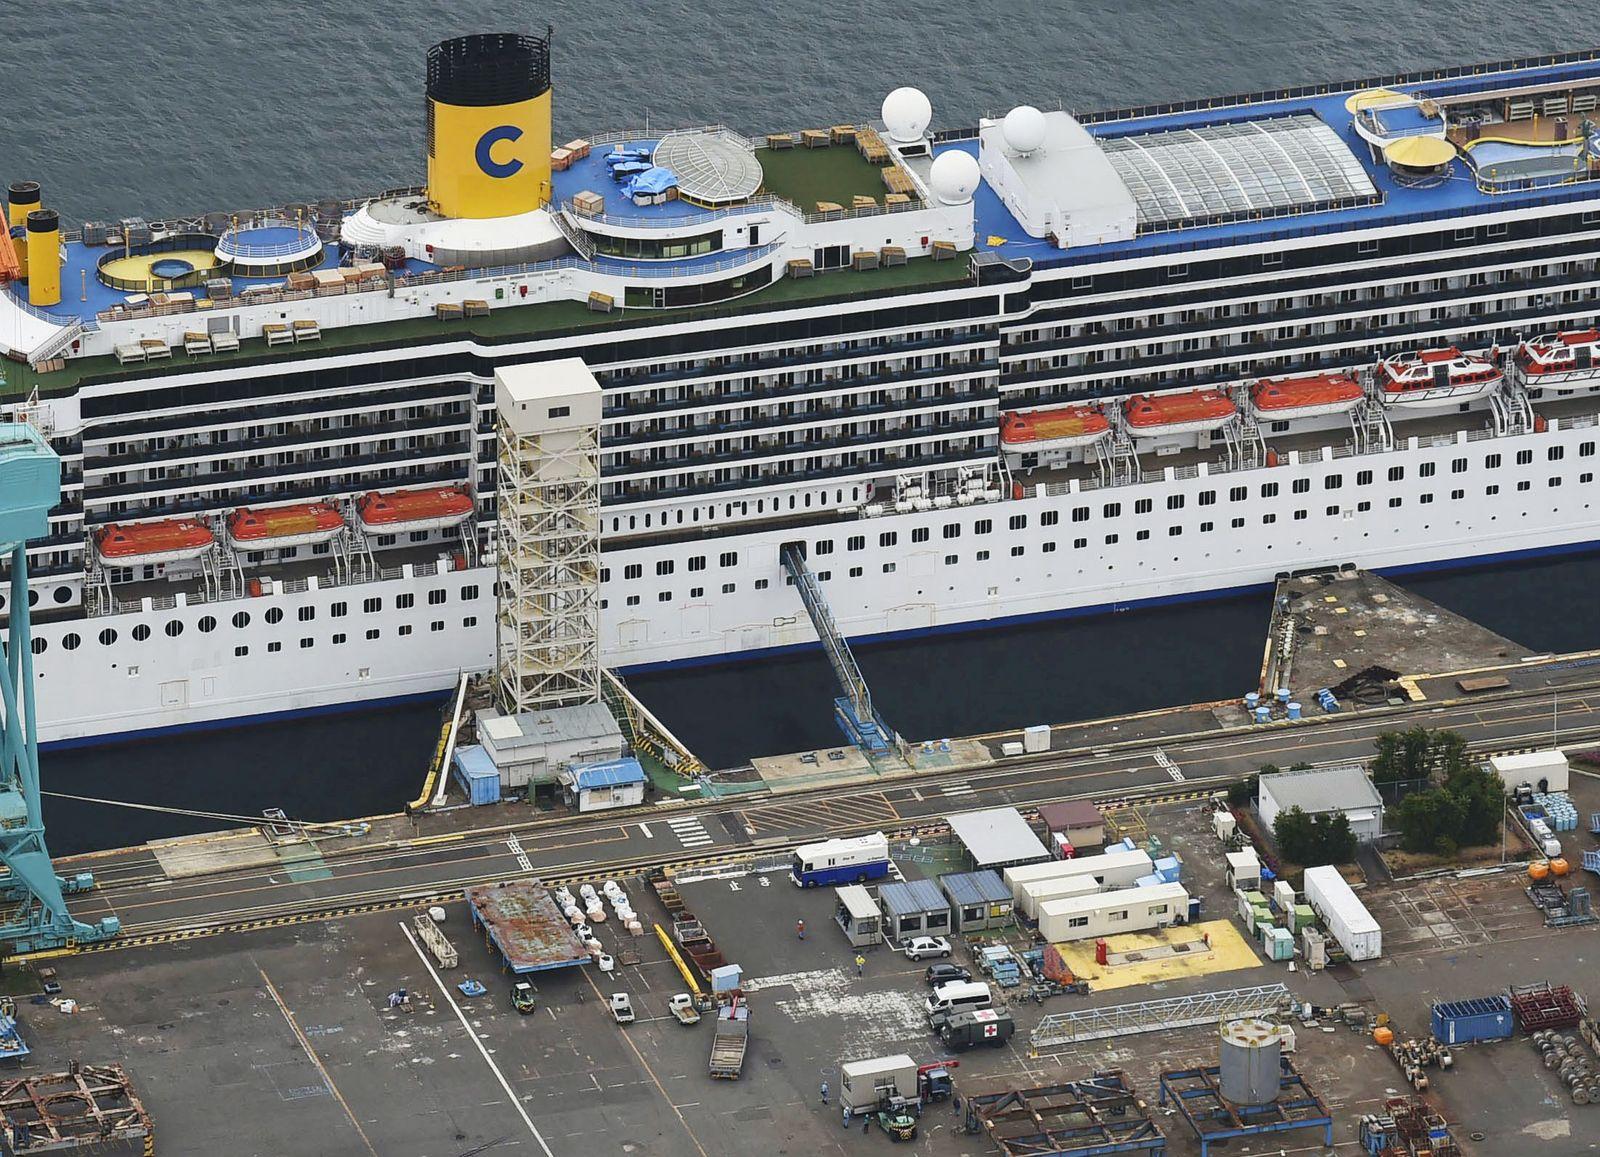 An aerial view shows Italian cruise ship Costa Atlantica in Nagasaki, Japan